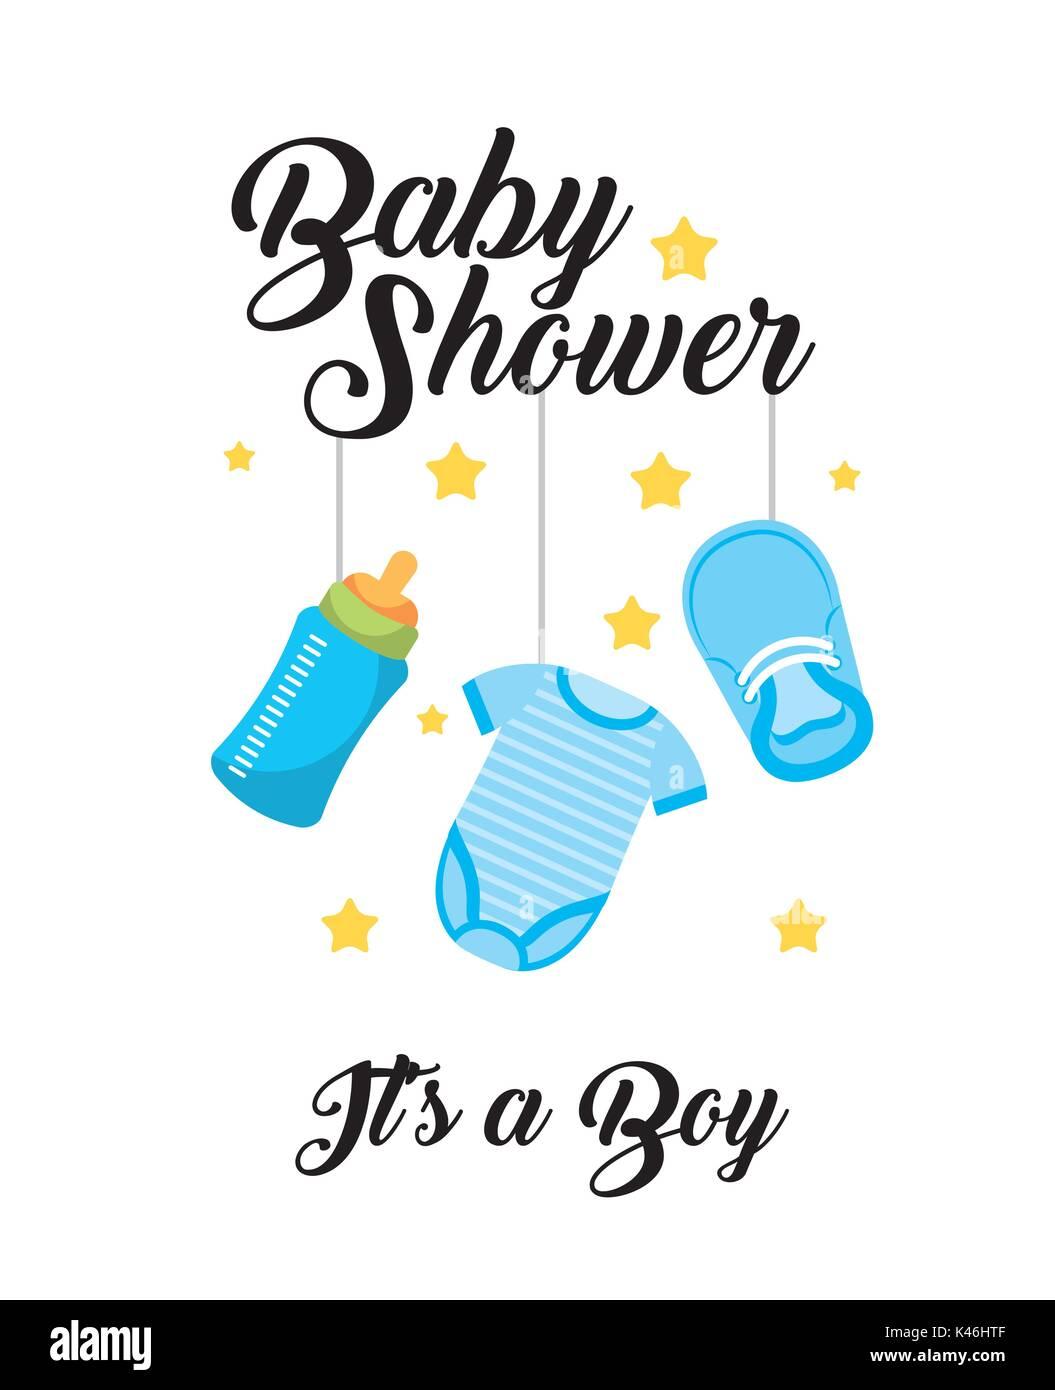 b34e946b8 baby shower its a boy clothes bottle shoe hang decoration card Stock ...